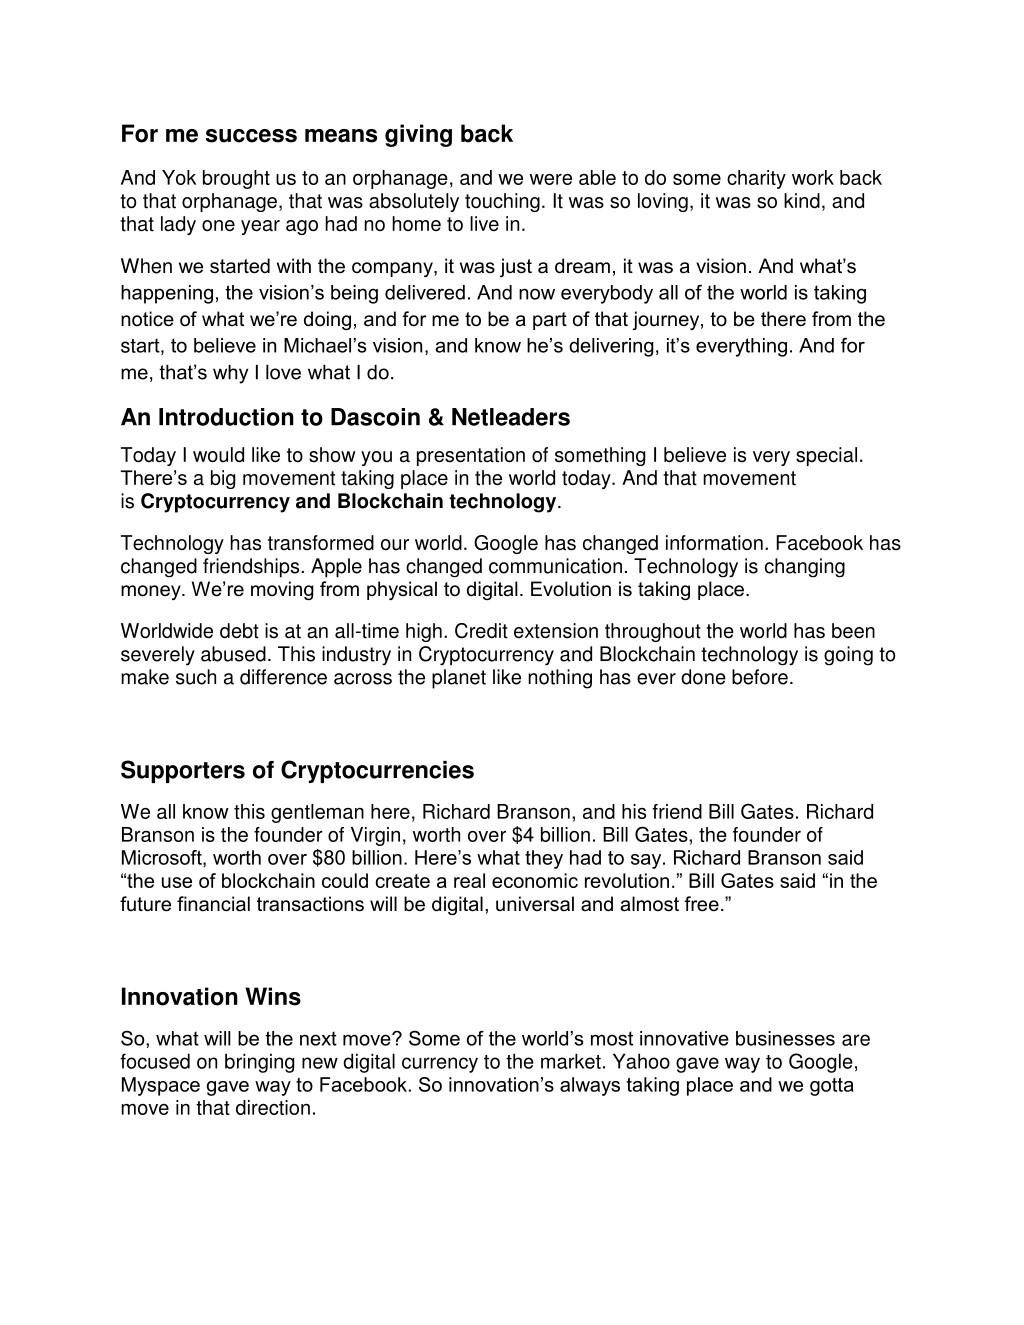 PPT - Paul McCarthy - Dascoin & Bitcoin Expert Cork